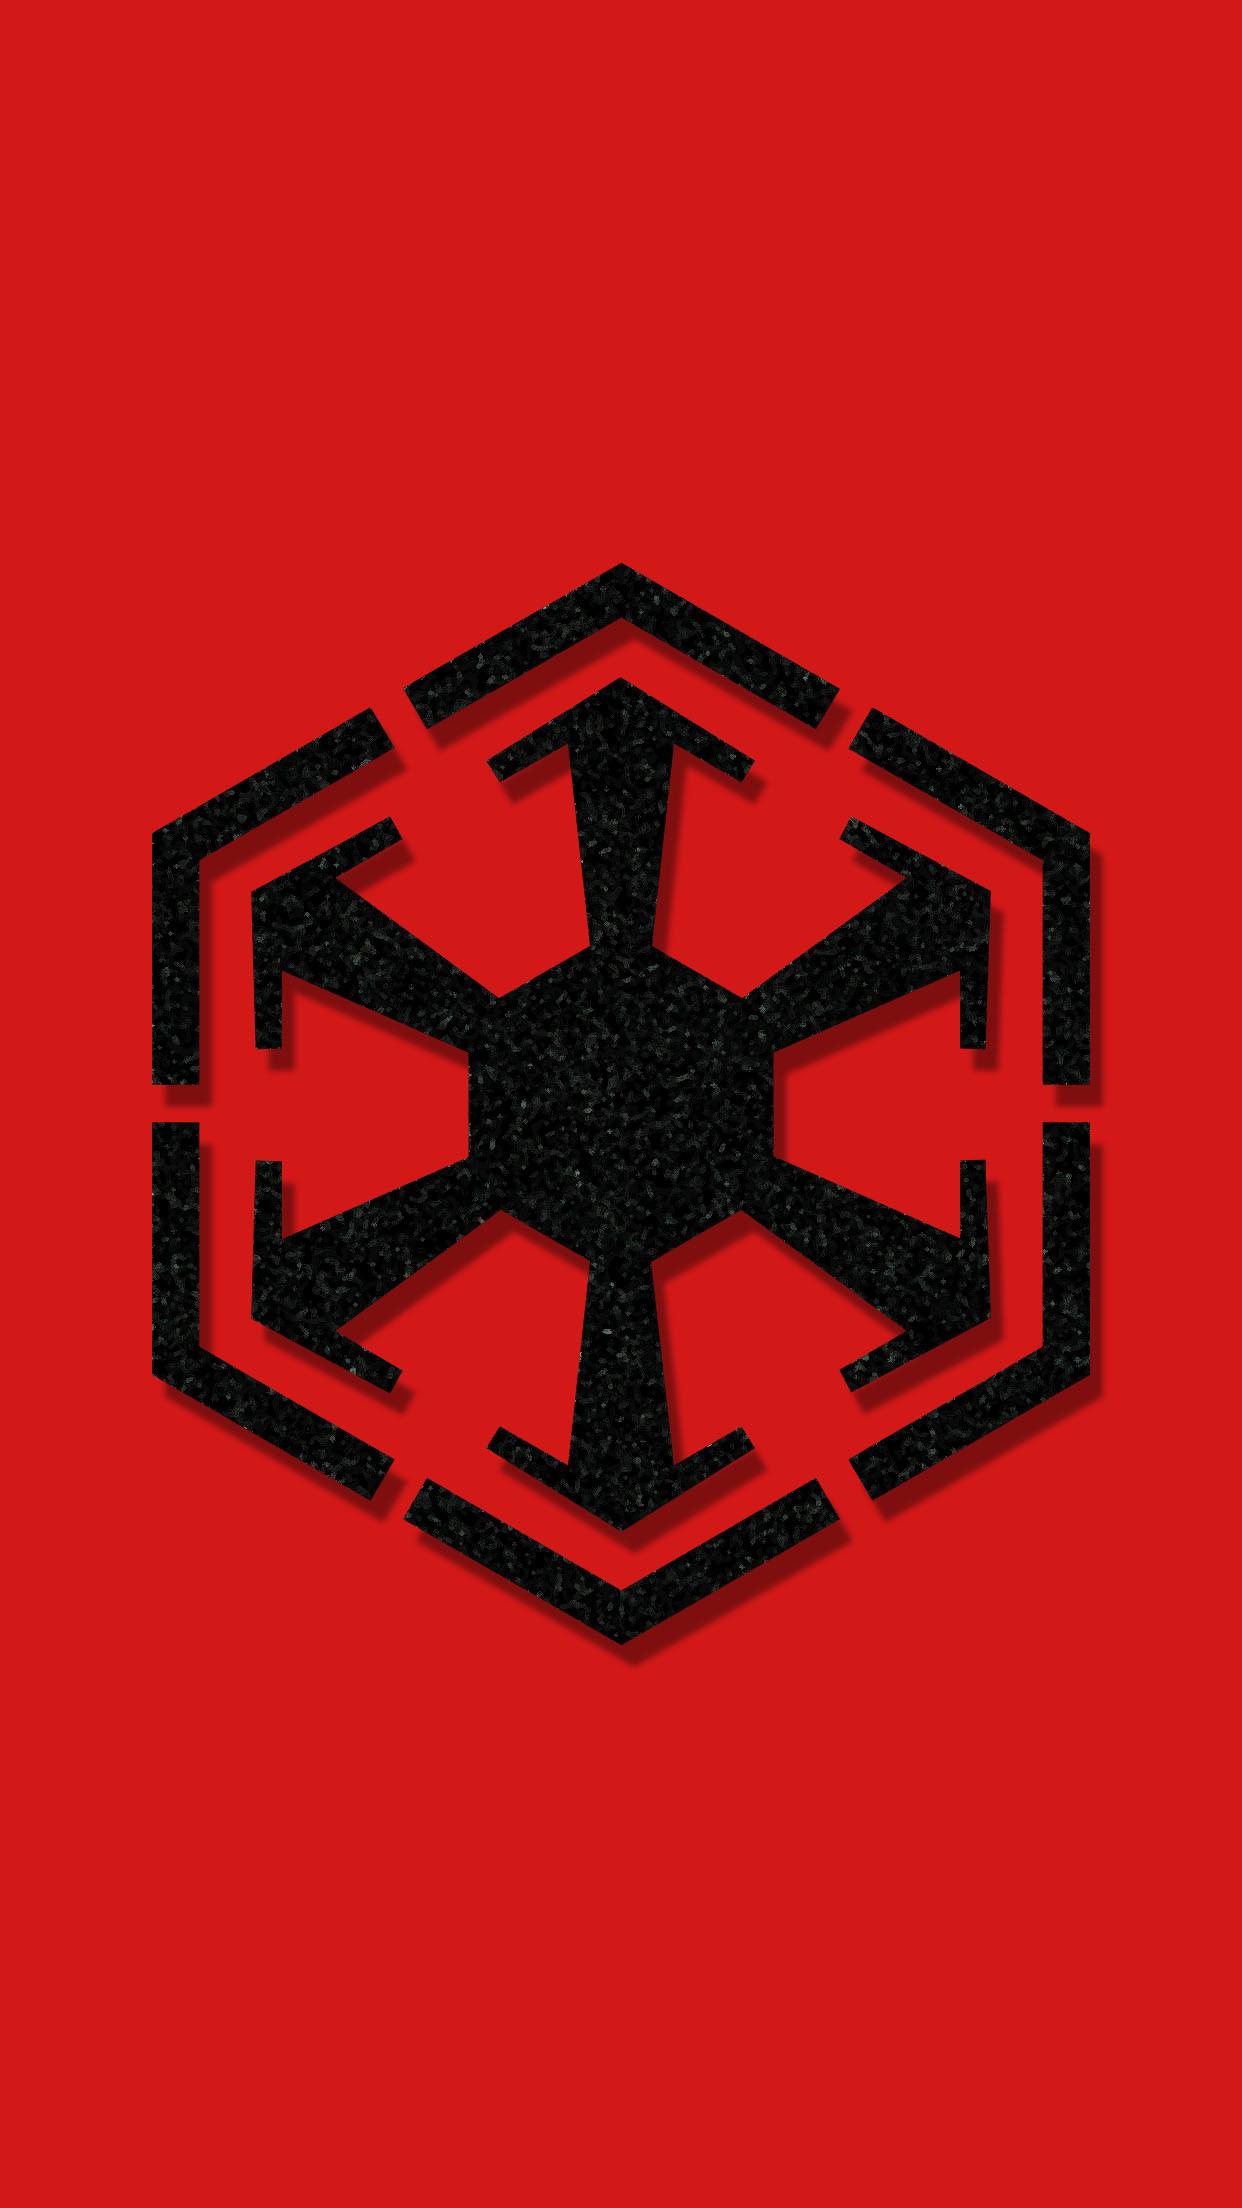 <b>Star Wars</b>, <b>Logo</